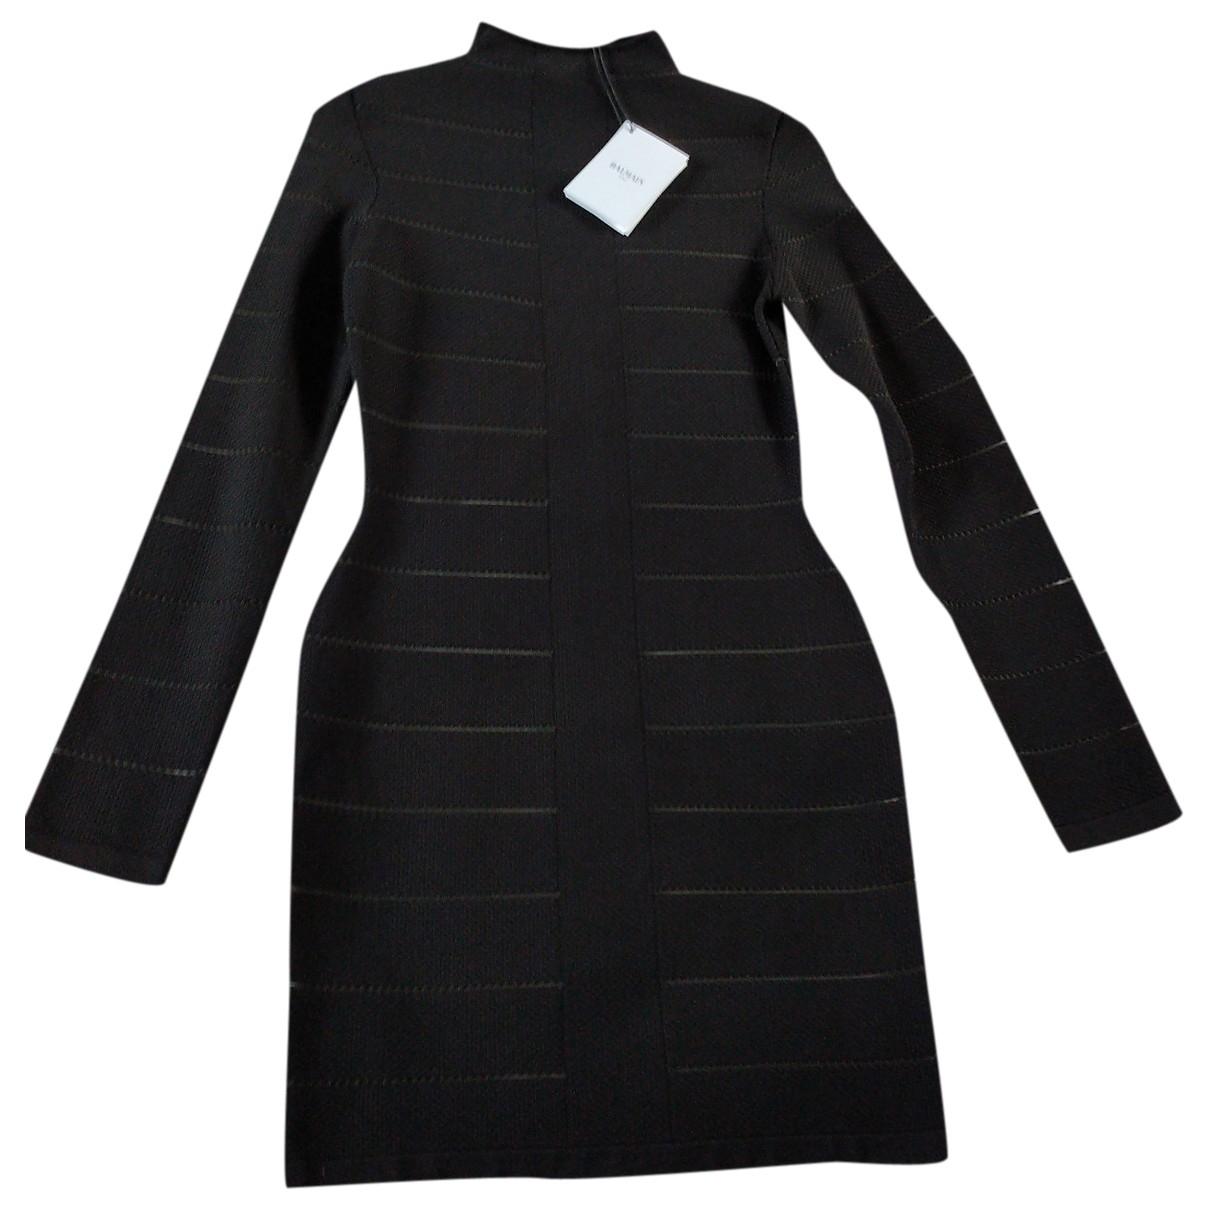 Balmain \N Black Cotton - elasthane dress for Women 38 FR